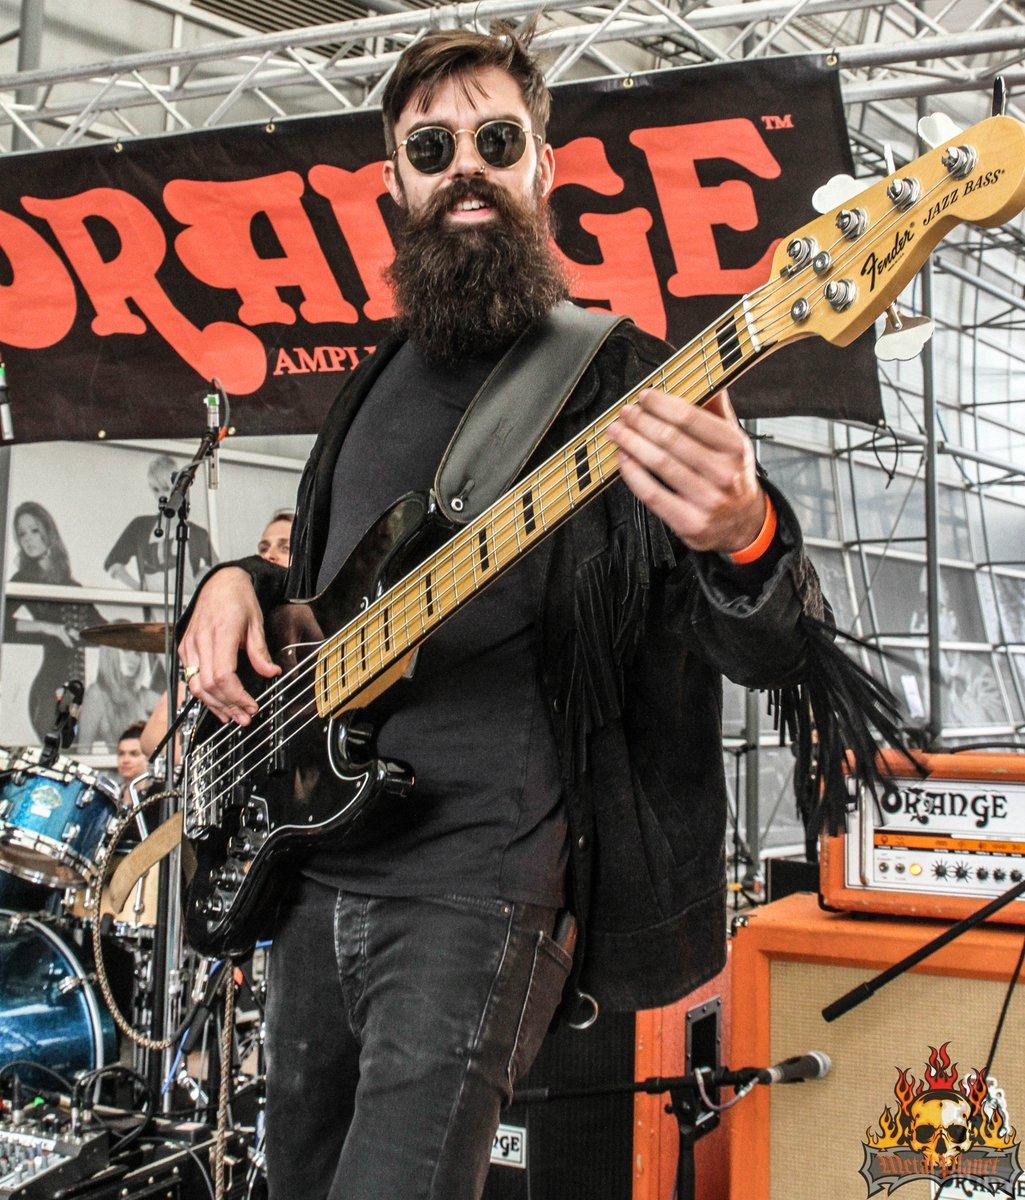 Vambo at Stone Free Festival (c) Metal Planet Music